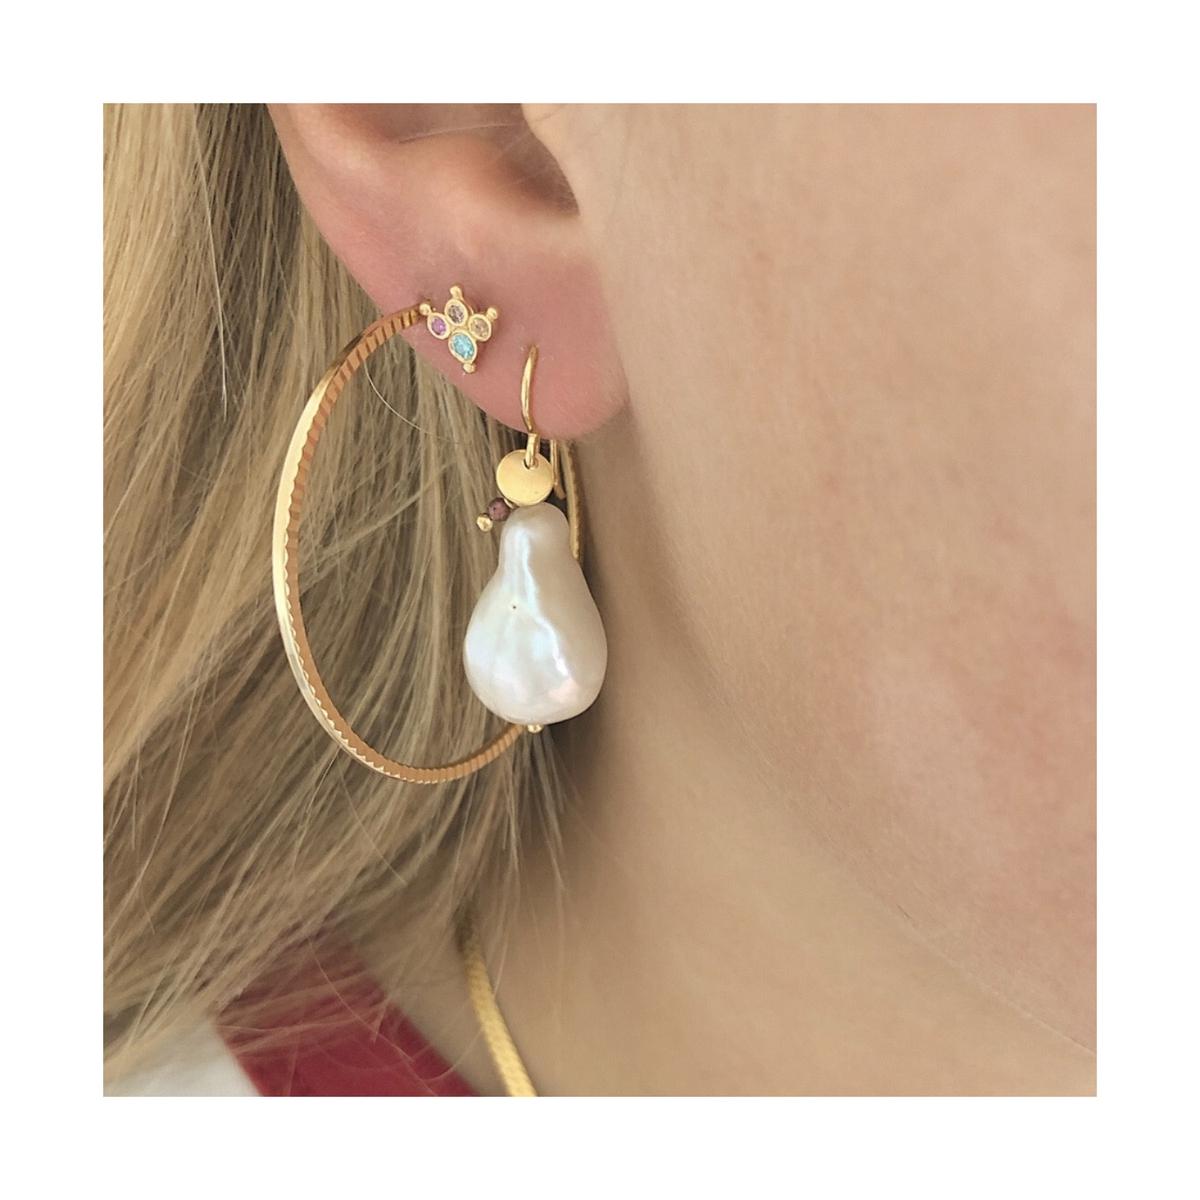 Stine A - Øredobb Petit Candy Fleur Earring Gold